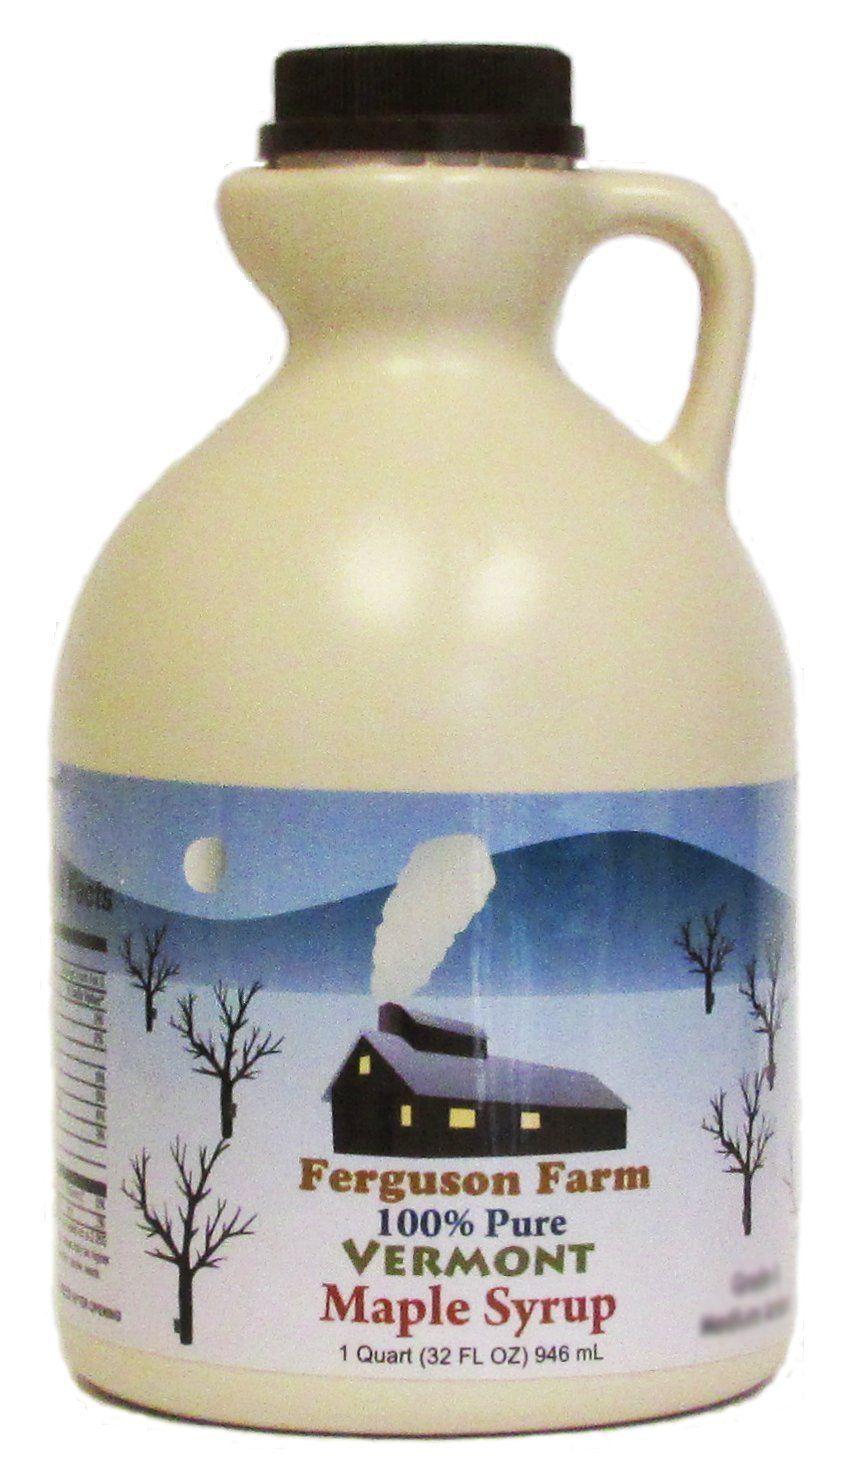 af35130958a Ferguson Farms 100% Pure Vermont Maple Syrup